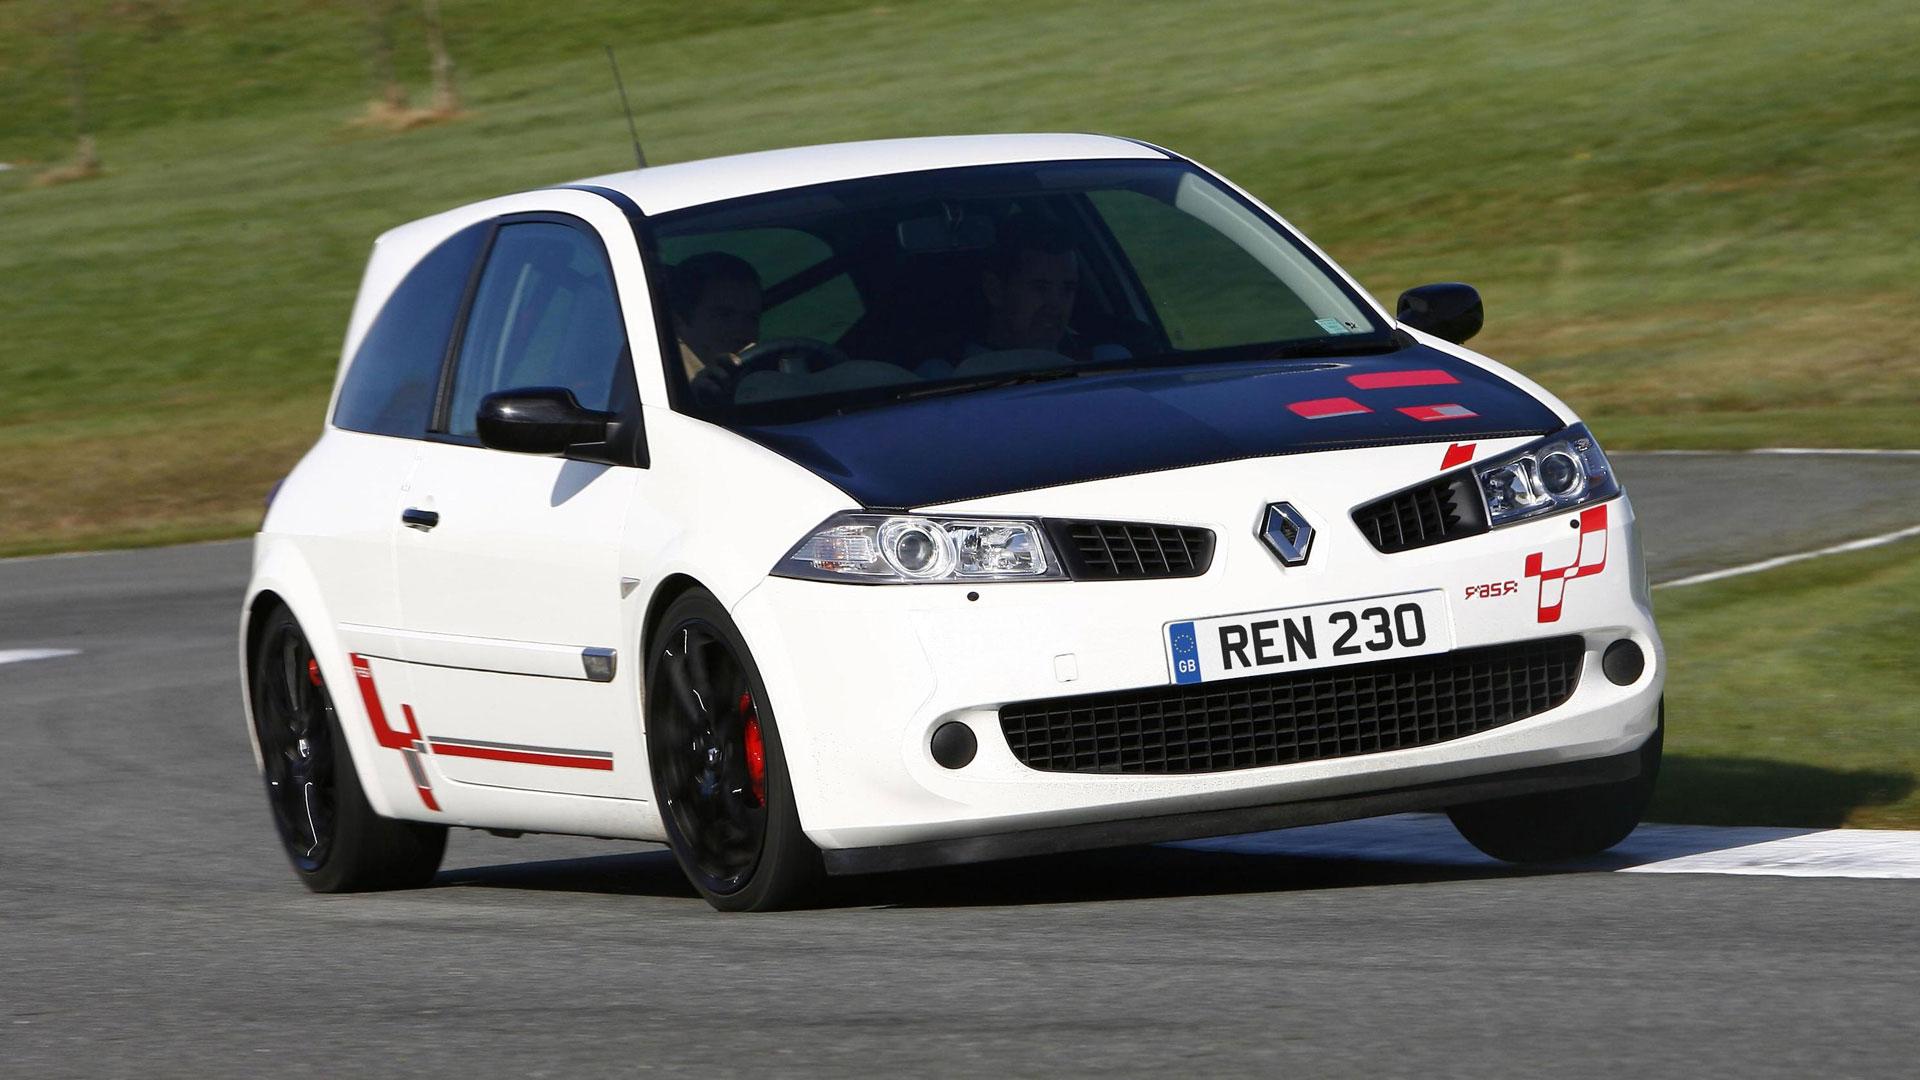 Renault Megane Renault Sport R26.R